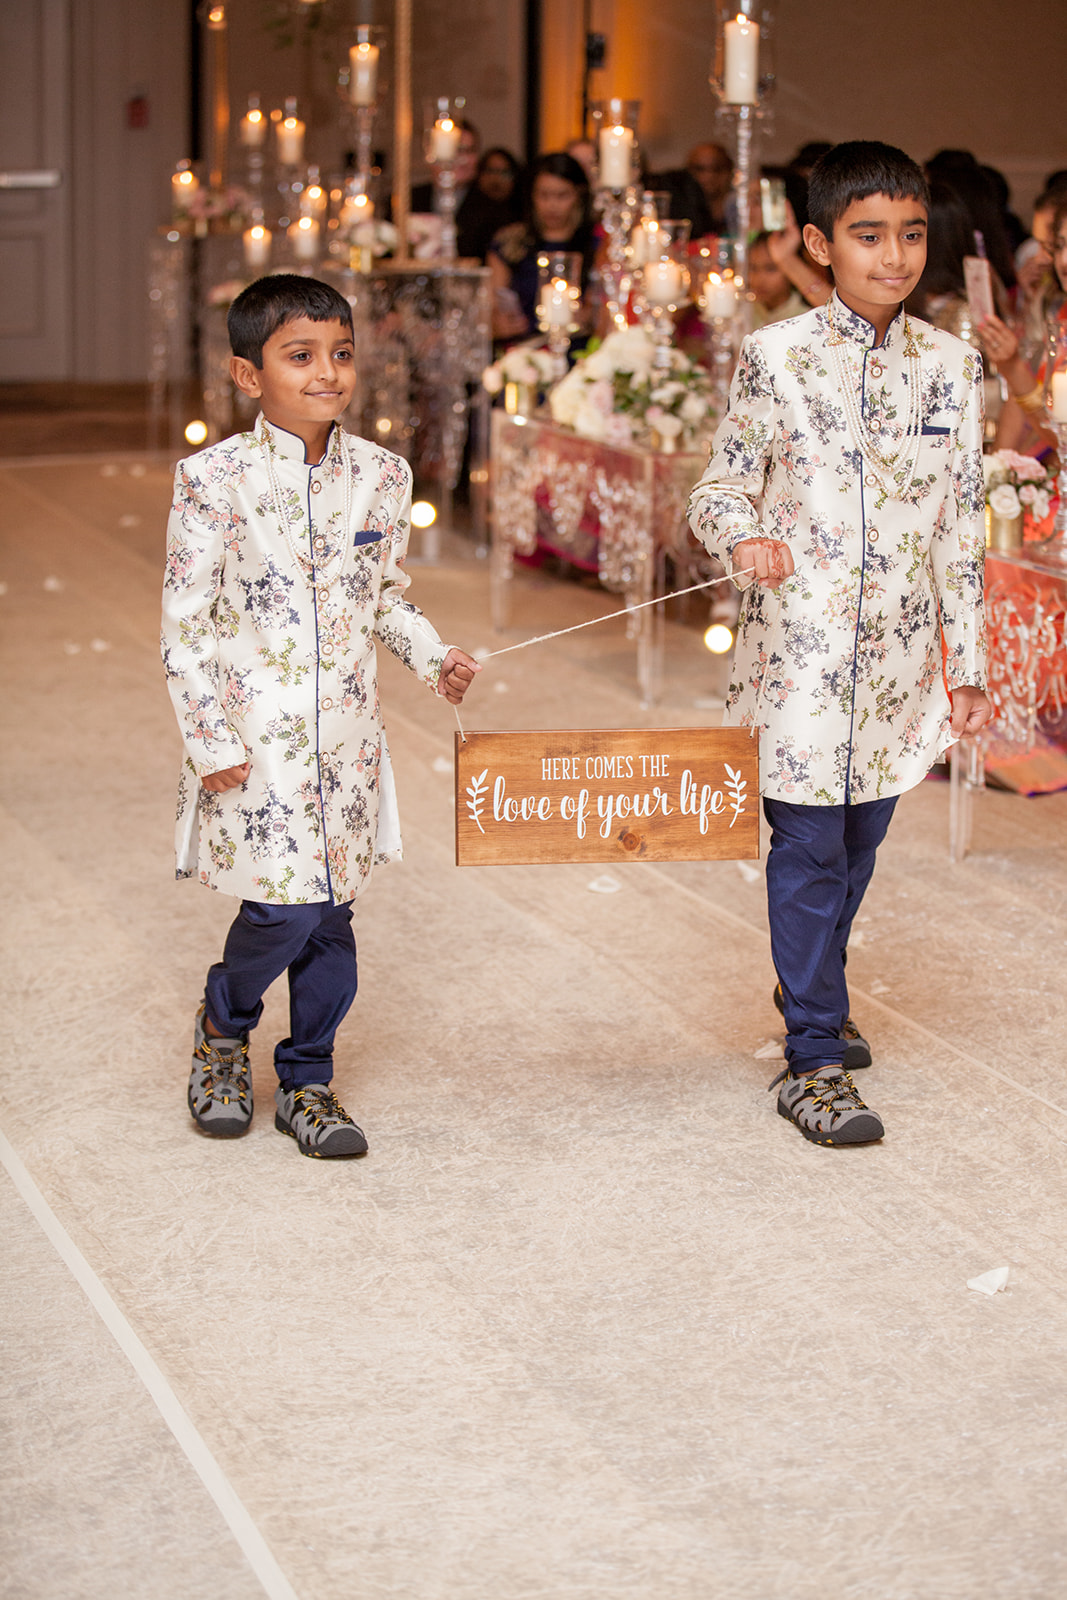 Le Cape Weddings - Puja and Kheelan - Ceremony -17.jpg